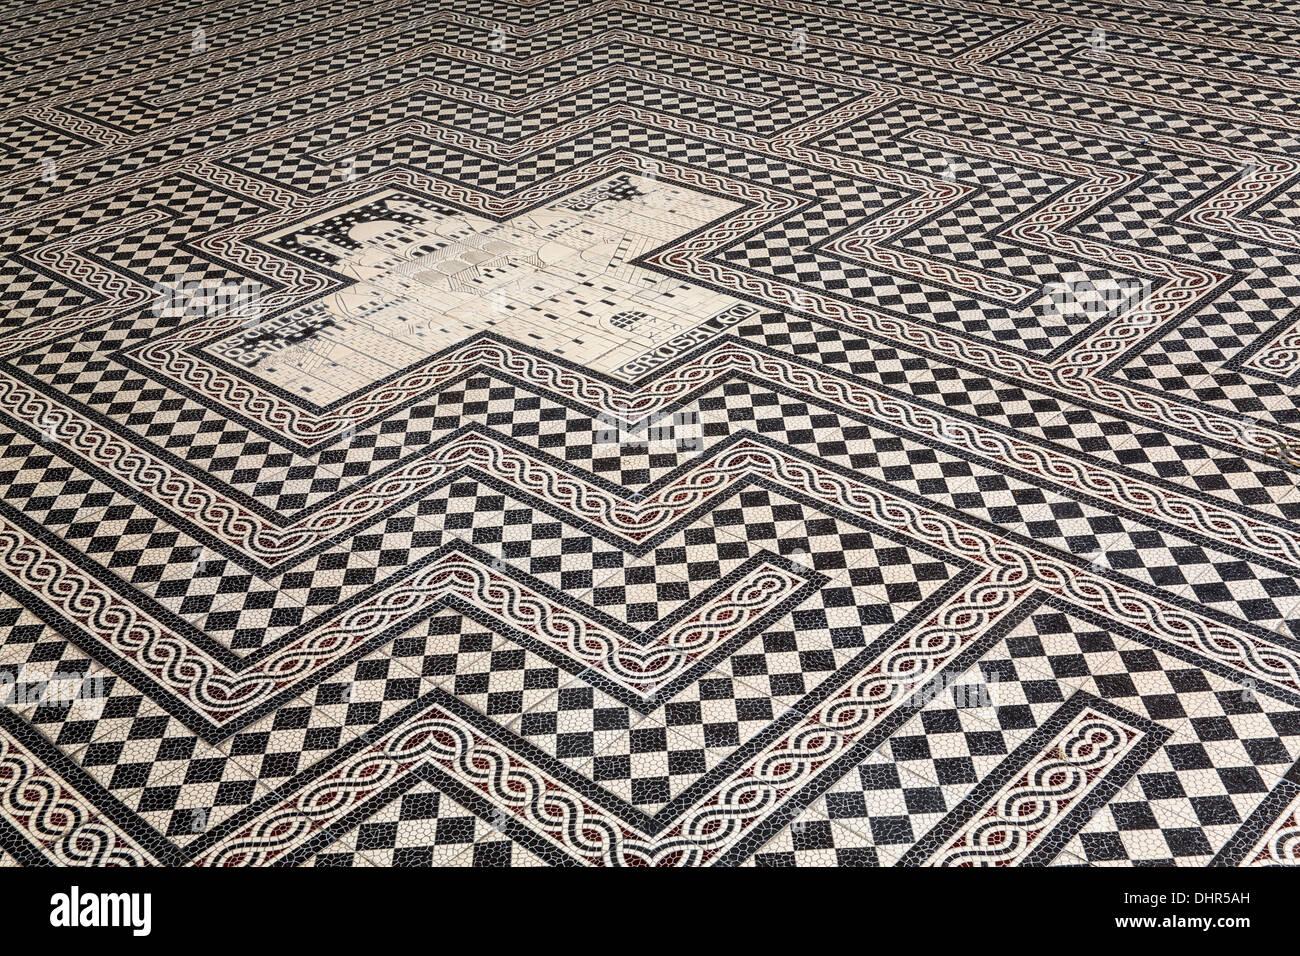 'Netherlands, Maastricht, Saint Servaas Basilica at Vrijthof square. Mosaic Labyrinth with in center Celestial Jerusalem ' - Stock Image